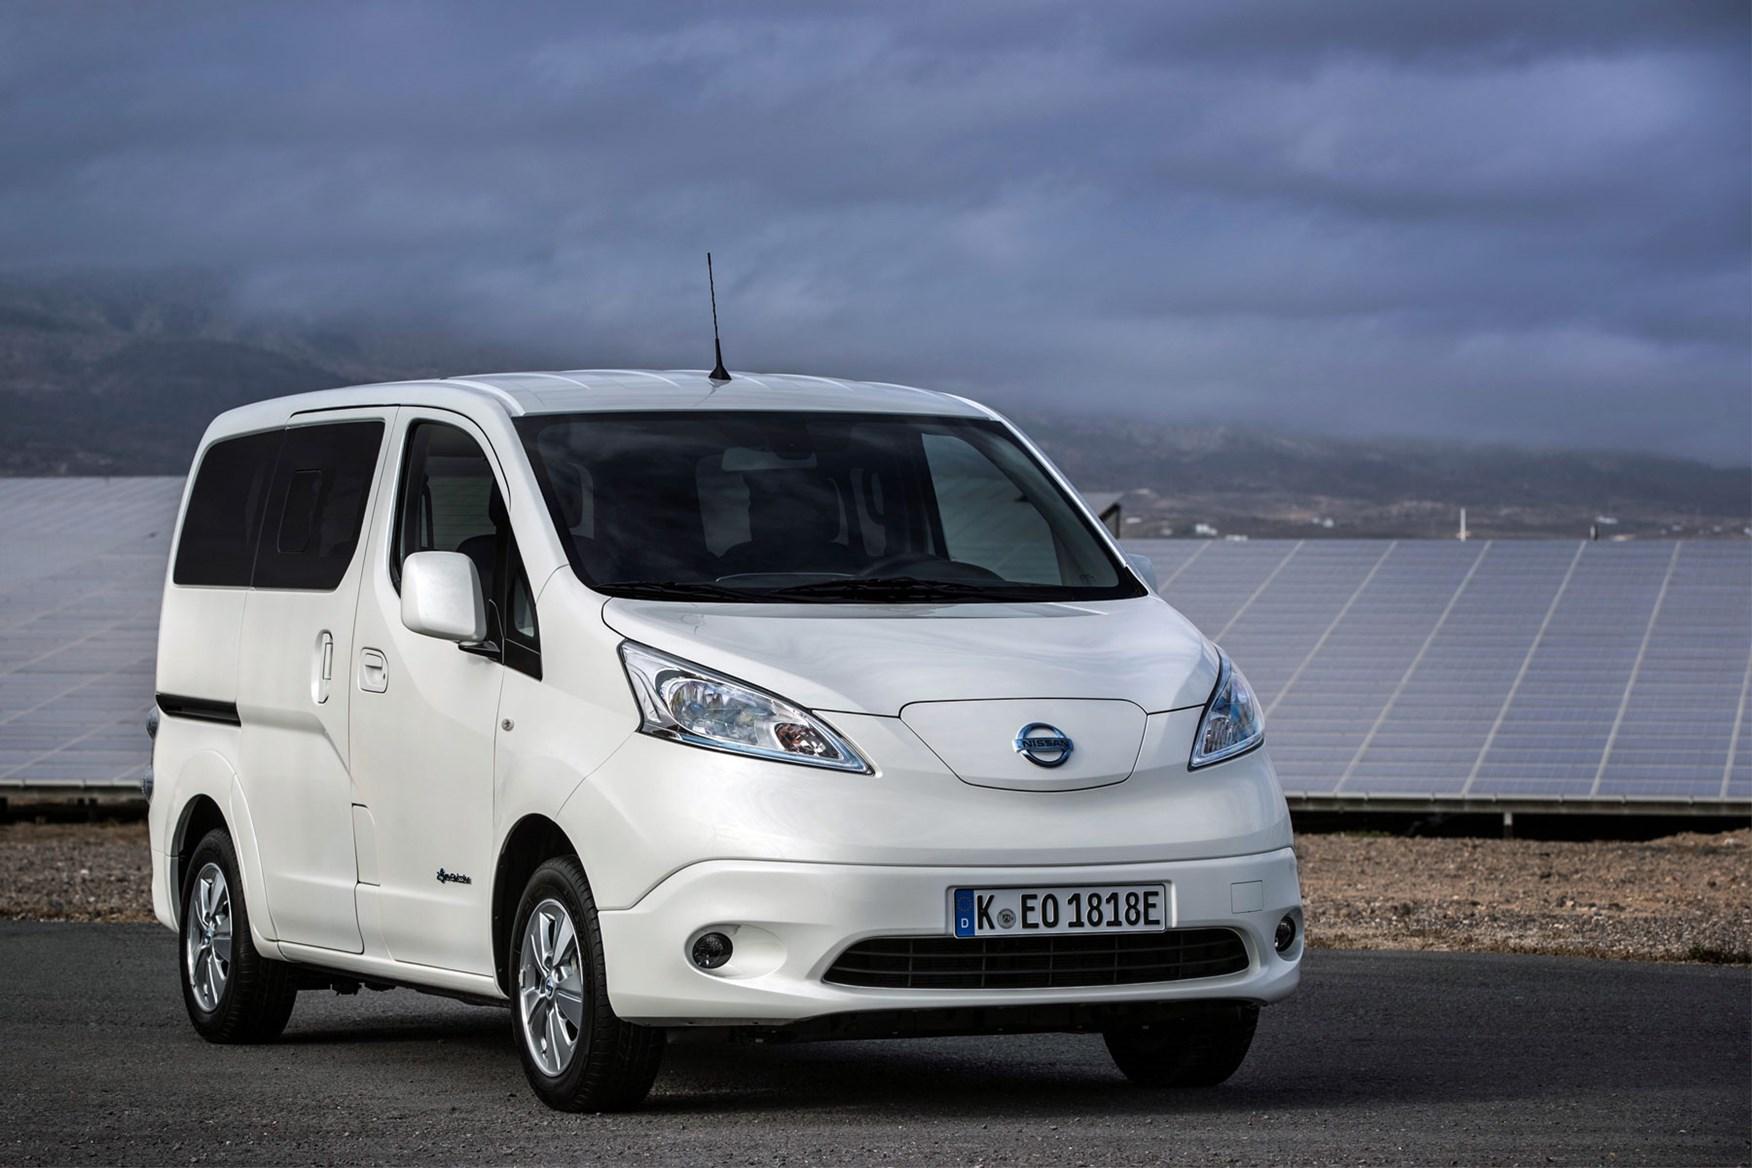 1c92490c926bf6 Nissan e-NV200 2018 electric van review - 60% more driving range ...